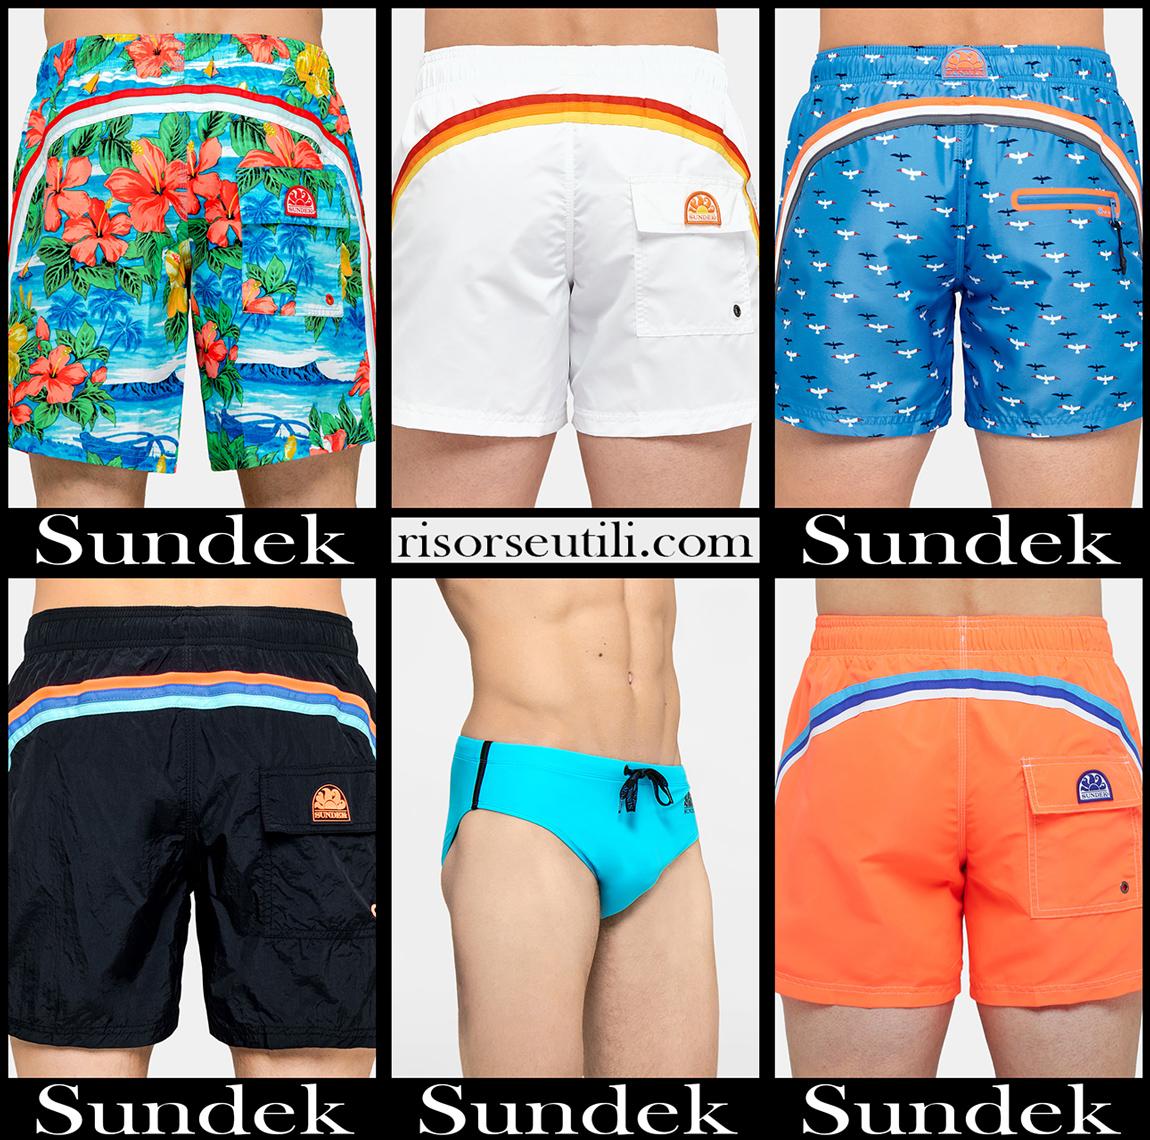 Sundek boardshorts 2020 accessories mens swimwear